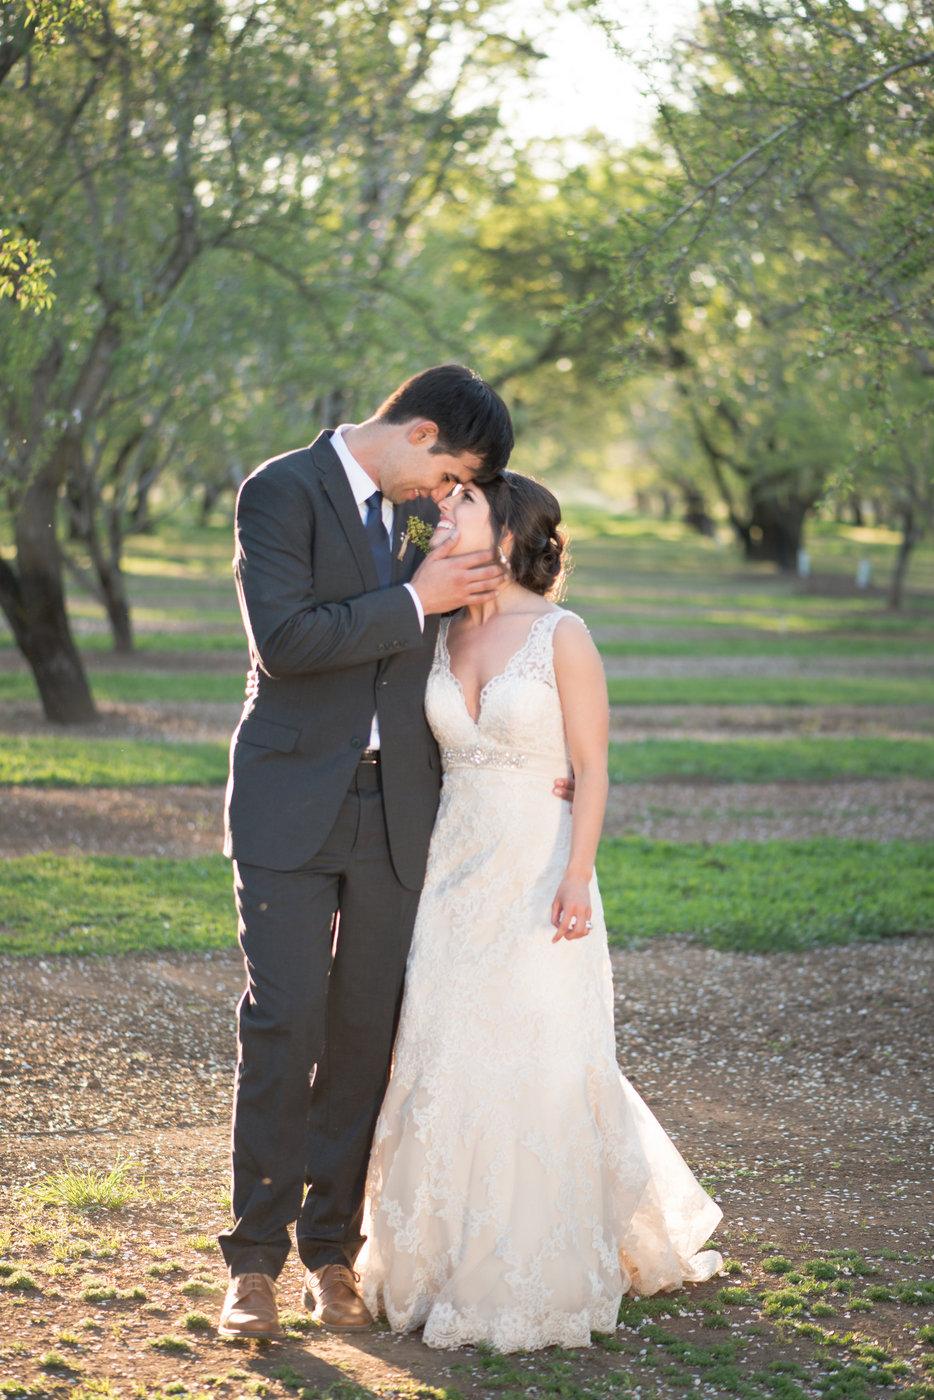 best-wedding-venue-in-chico-patrick-ranch-photospg